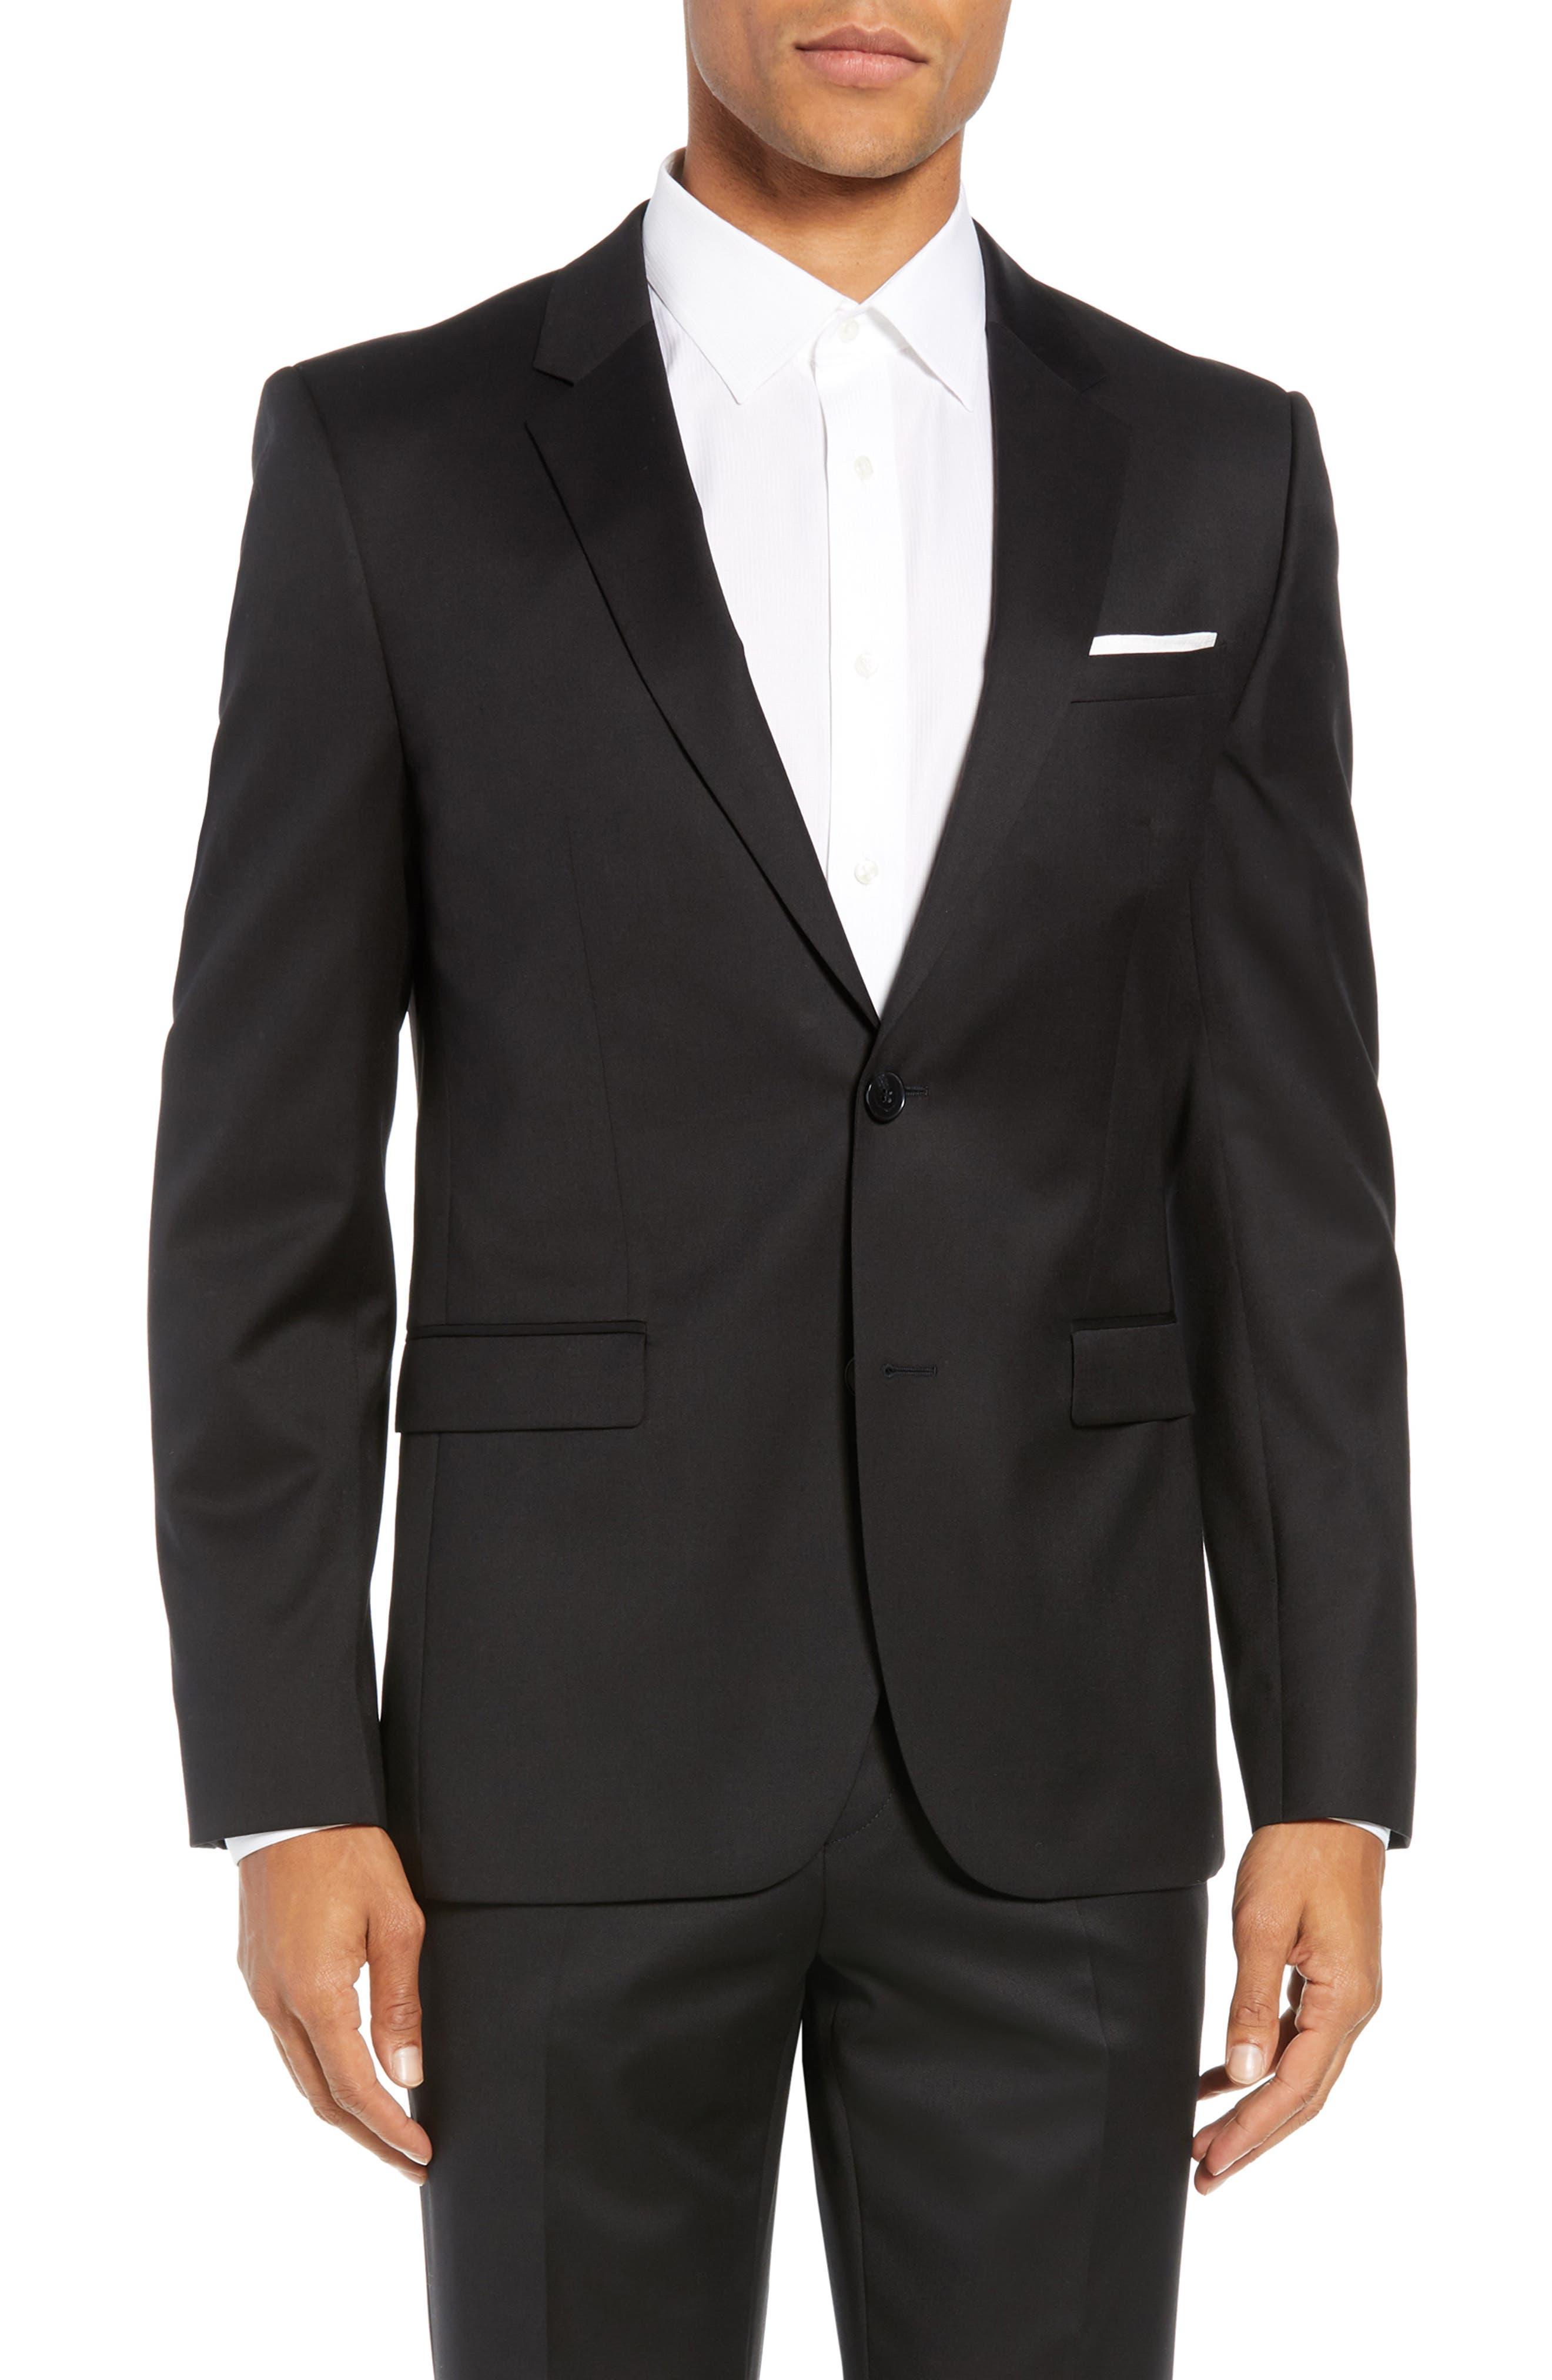 Aldon Extra Slim Fit Blazer,                         Main,                         color, BLACK